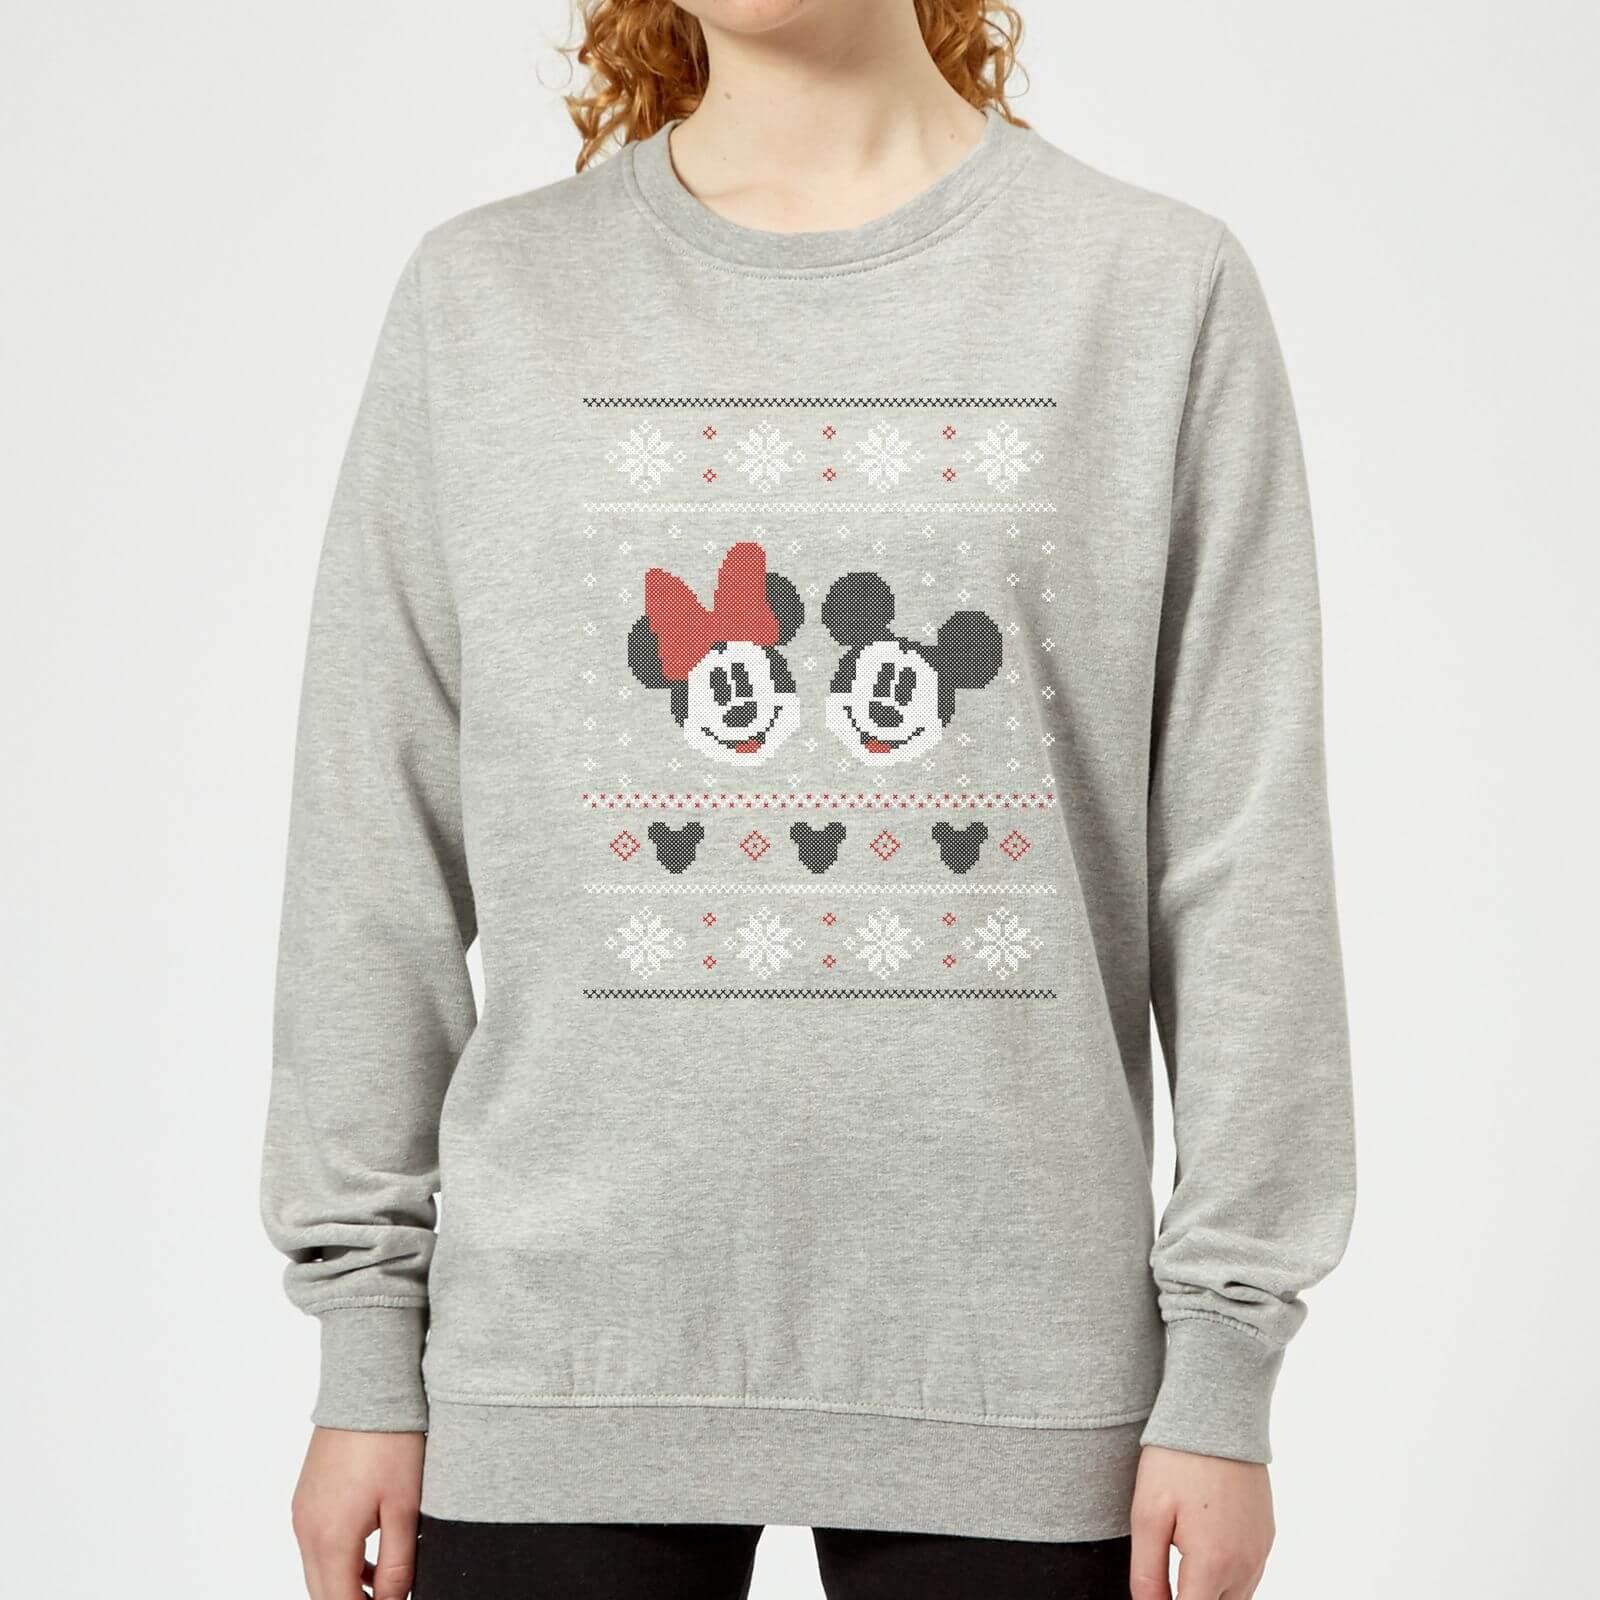 Disney Mickey And Minnie Womens Christmas Sweatshirt Grey